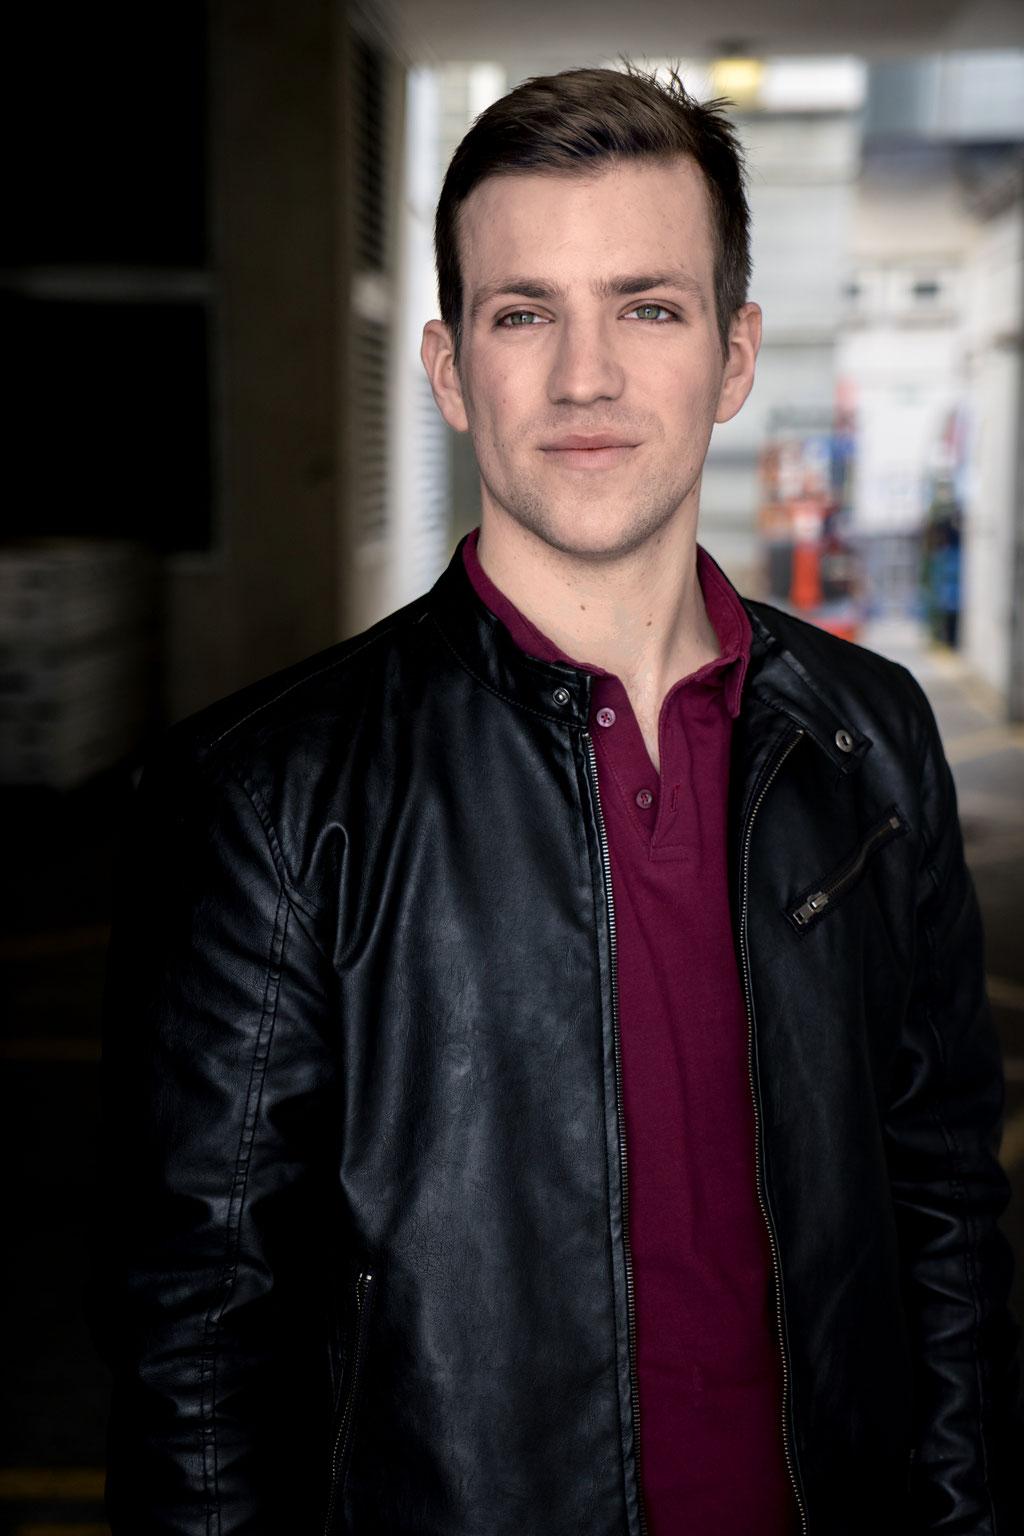 Dominic Stewart - Tenor - Photo & Styling by Melina Johannsen